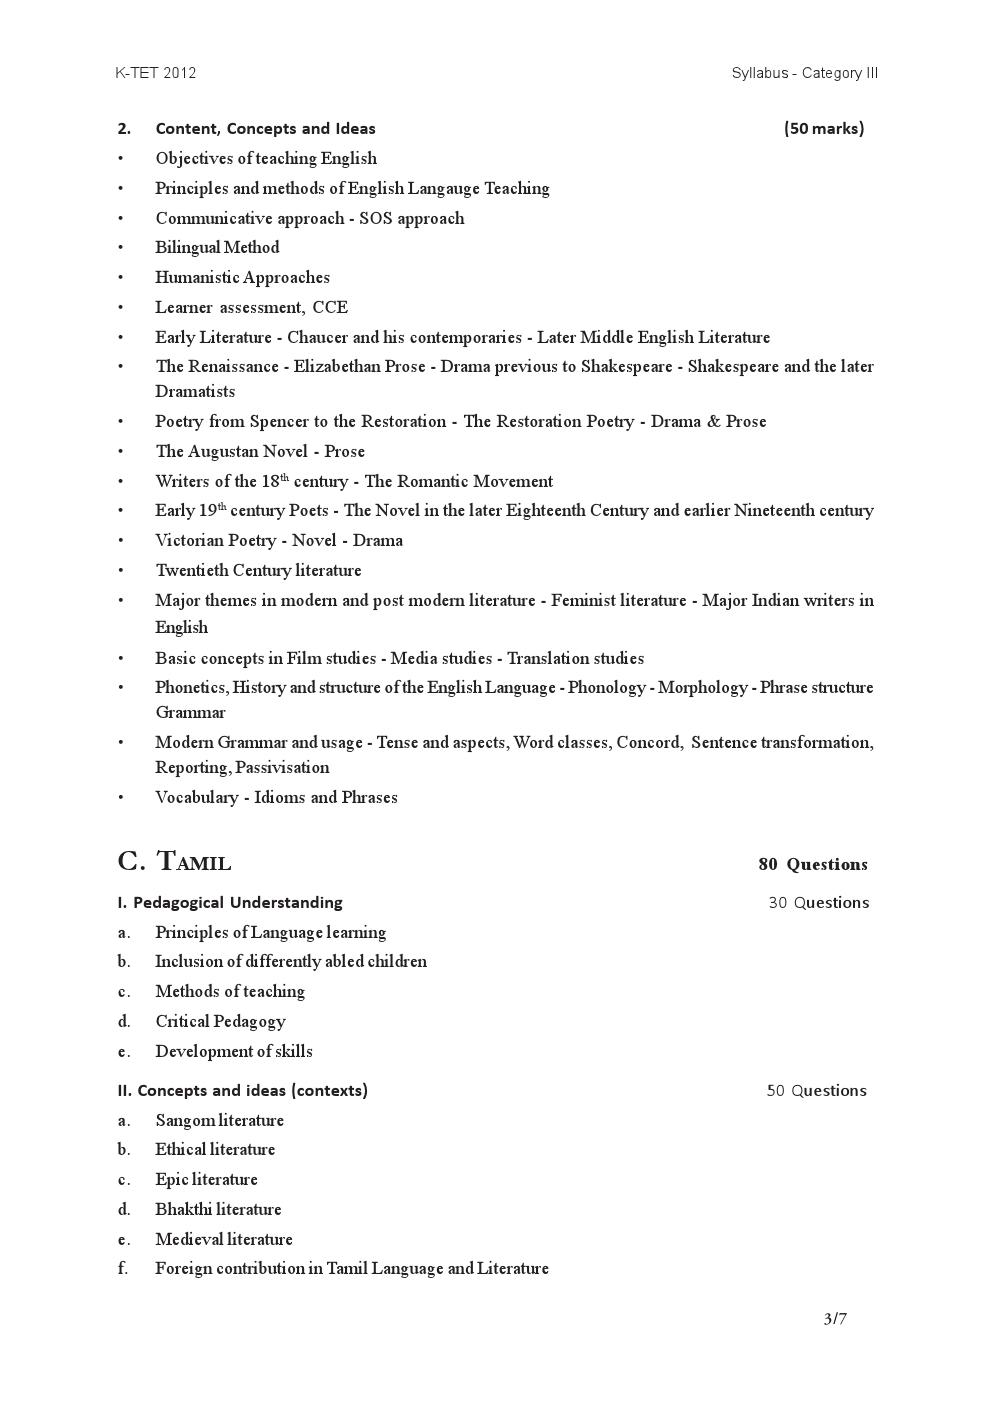 http://masterstudy.net/pdf/syllabus30007.jpg